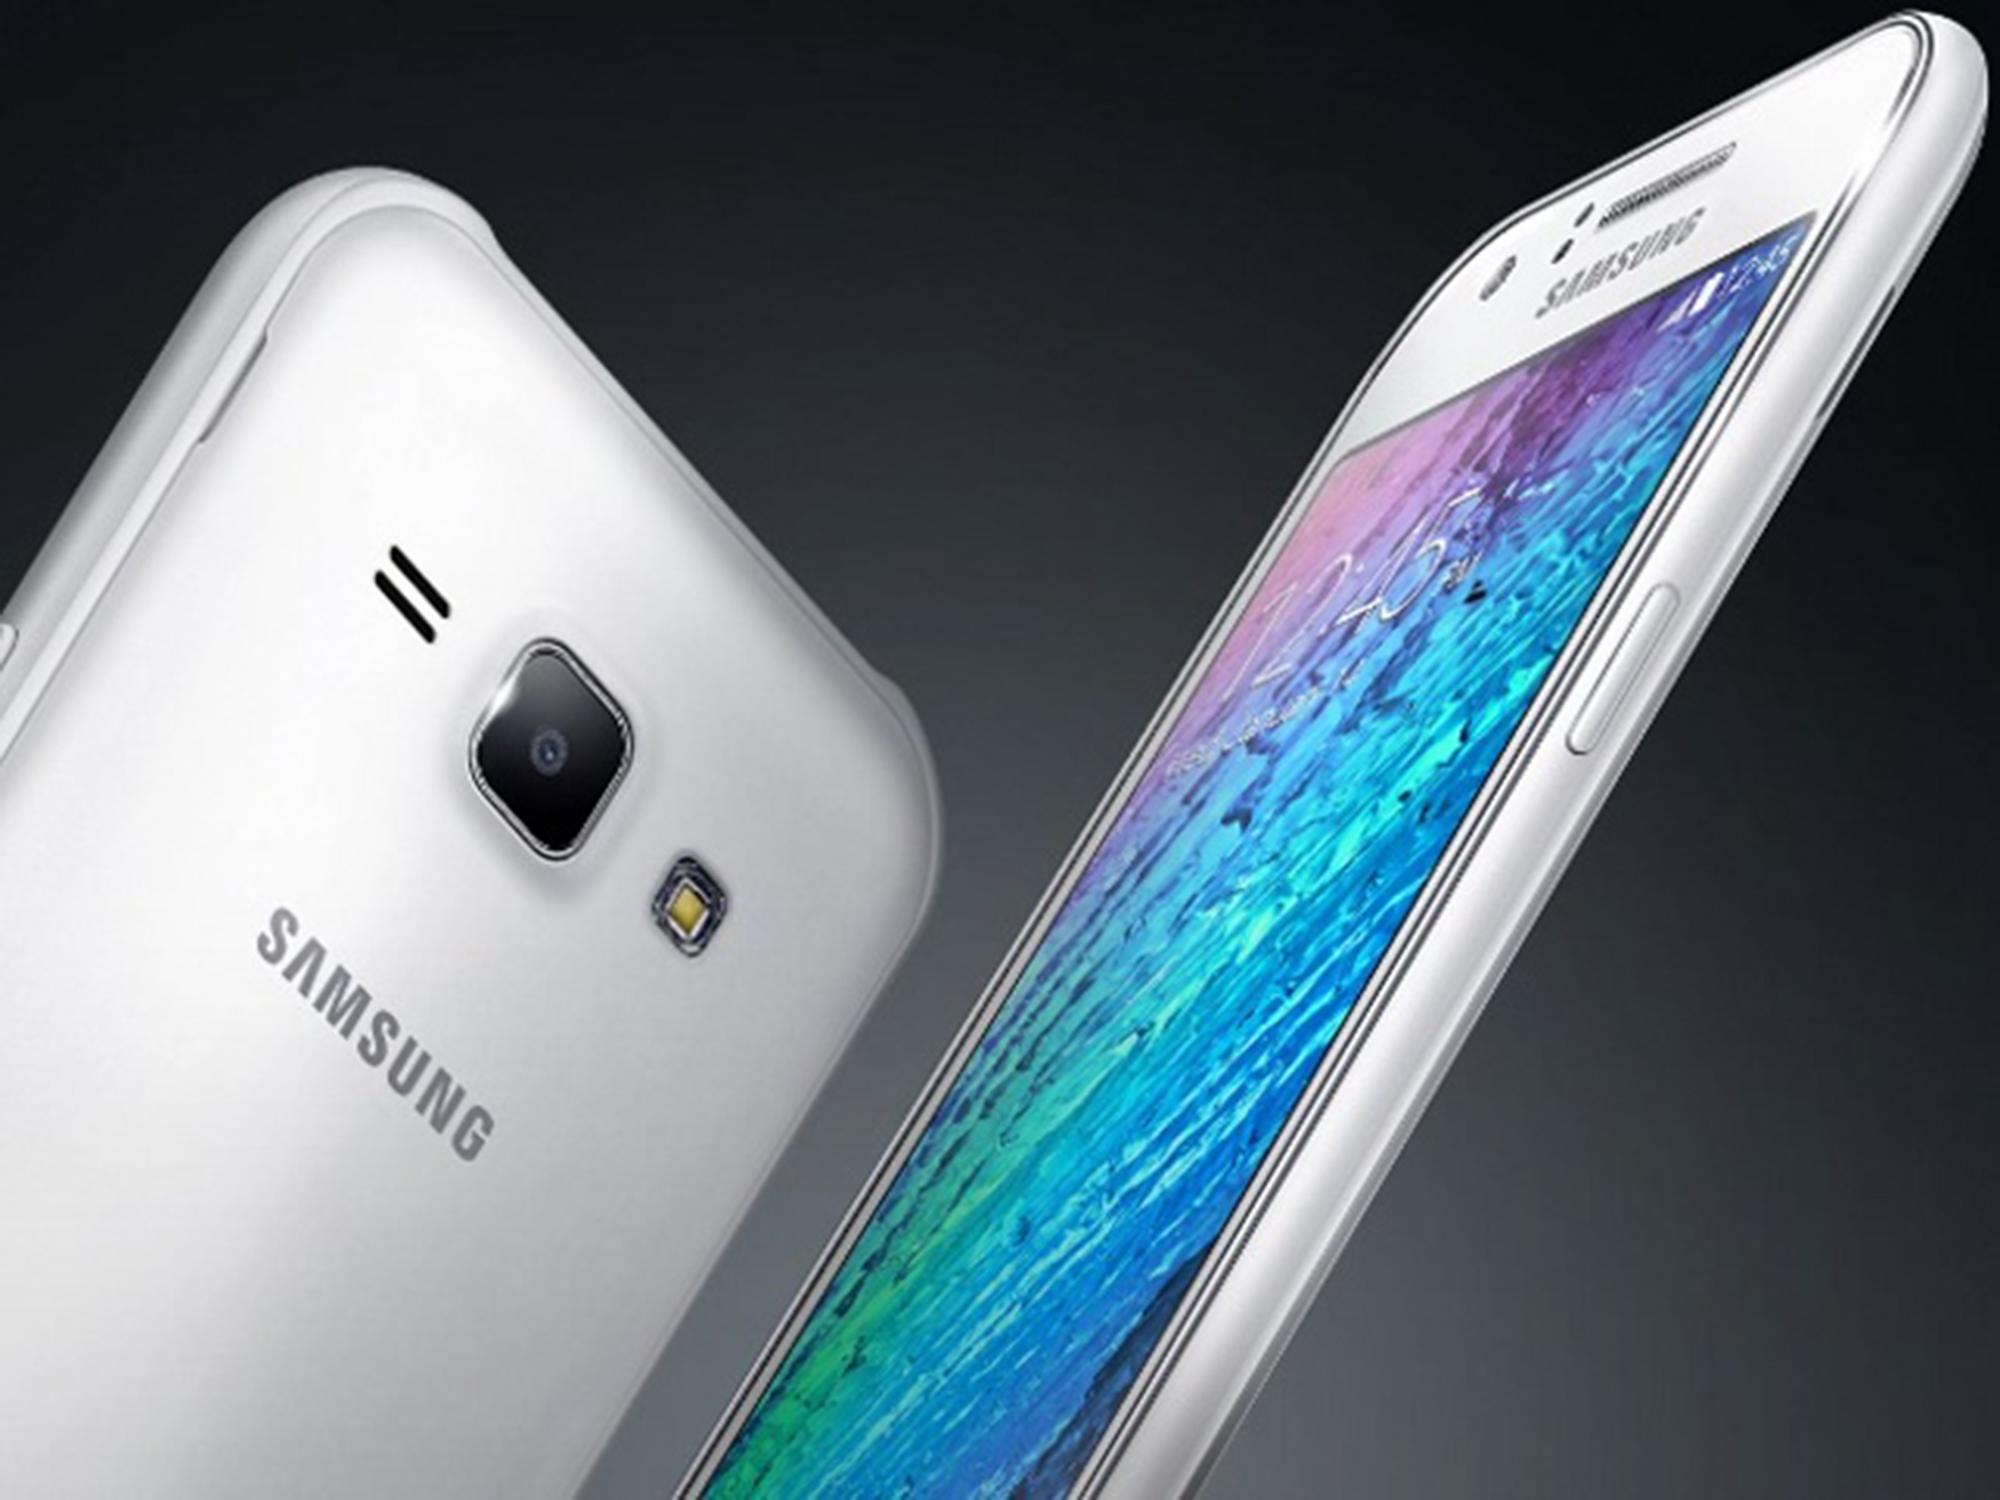 j8سامسونگ Samsung Galaxy J1, Mau Jadi Jagoan Ini-Itu Ga' Perlu Mahal Halaman 3